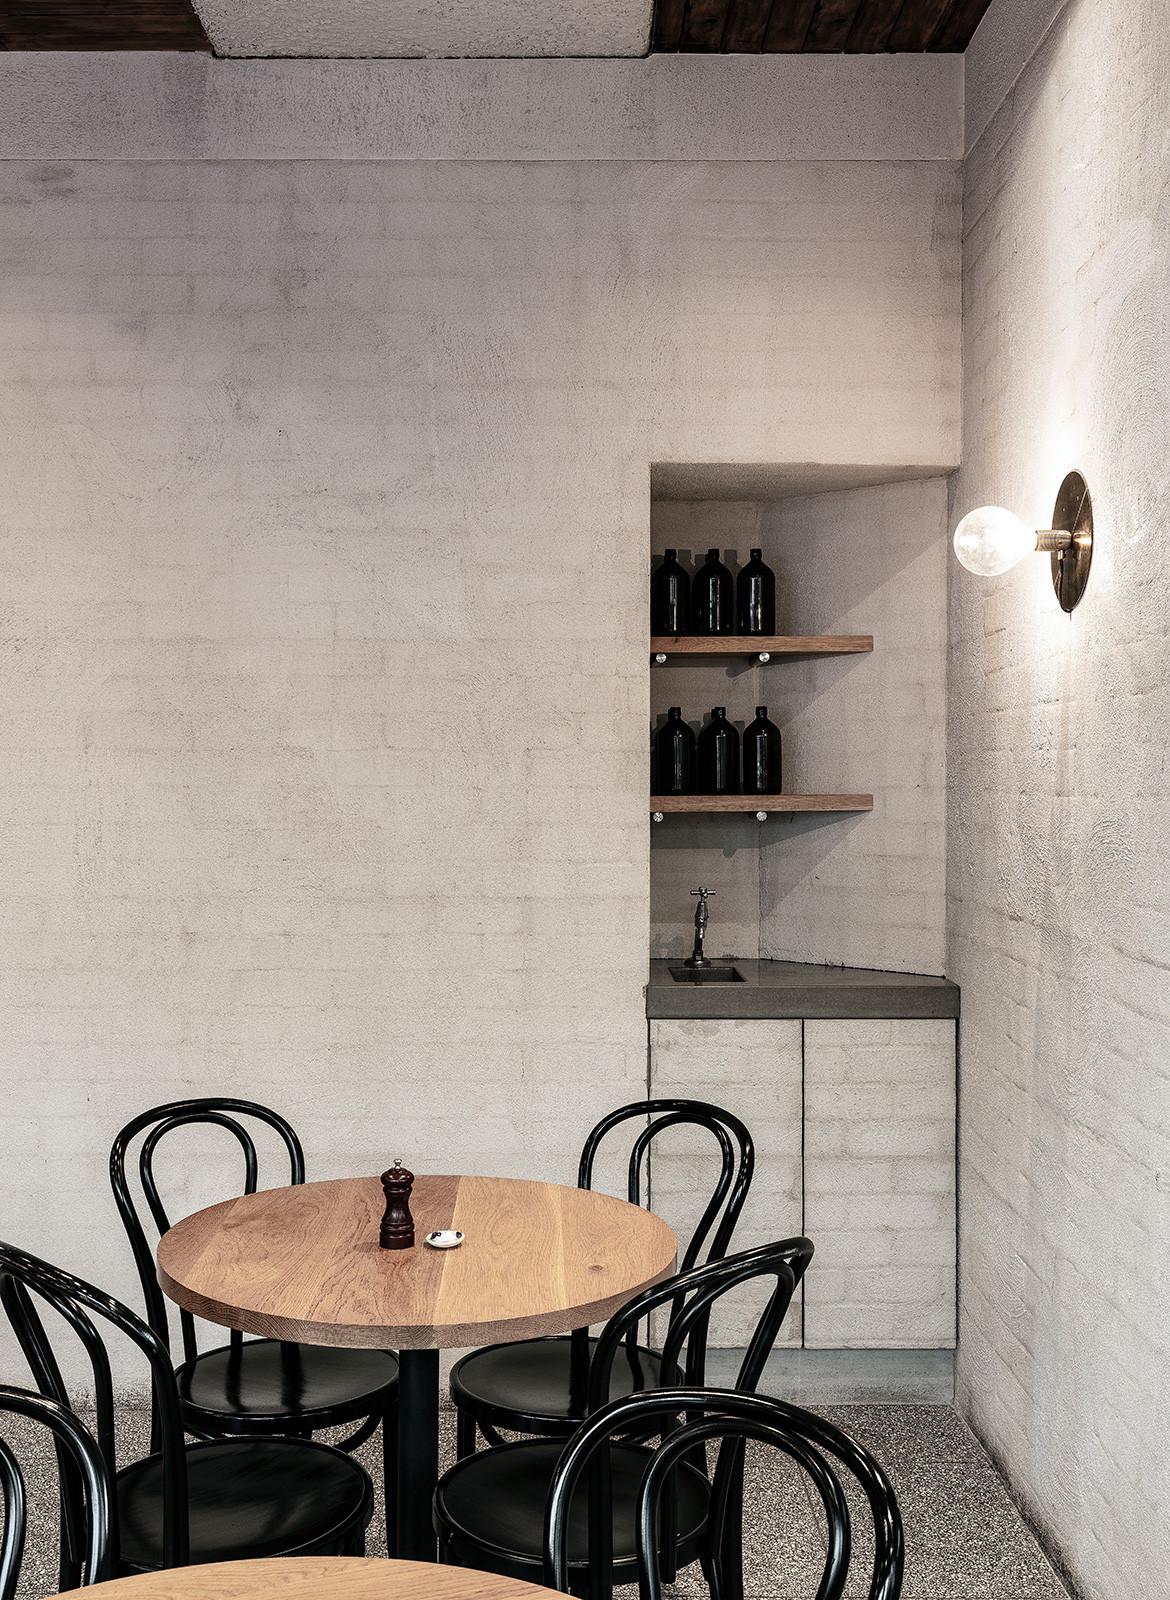 Ricco Bloch High St Cafe Randwick storage nook